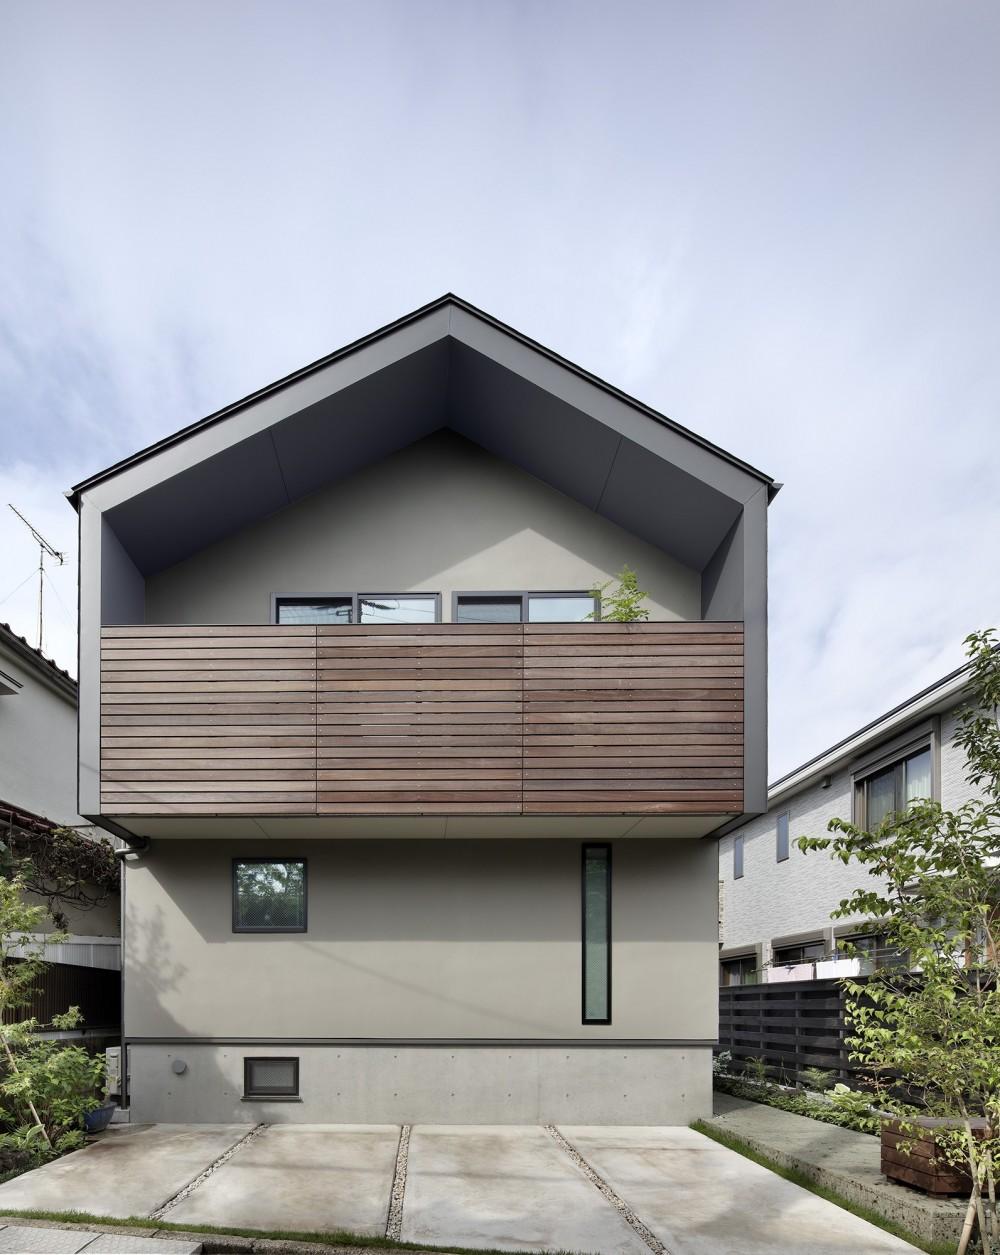 桜上水の住宅 / 半地下と屋上の効果 (外観)